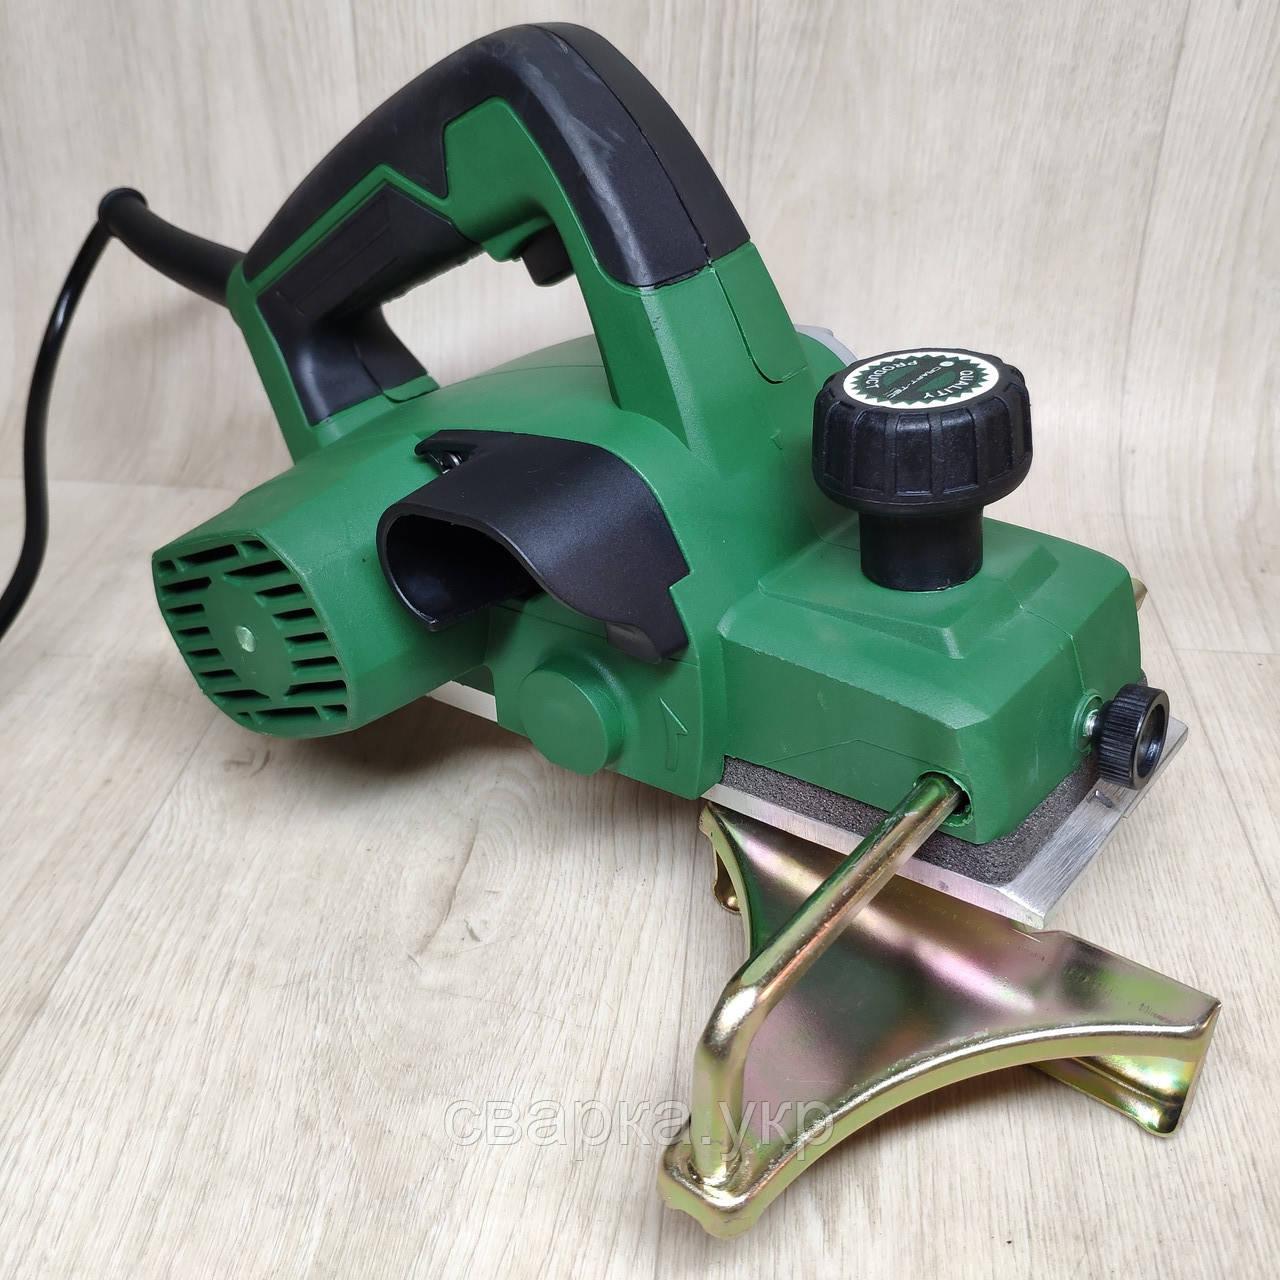 Електрорубанок Рубанок Craft-tec PXEP-482